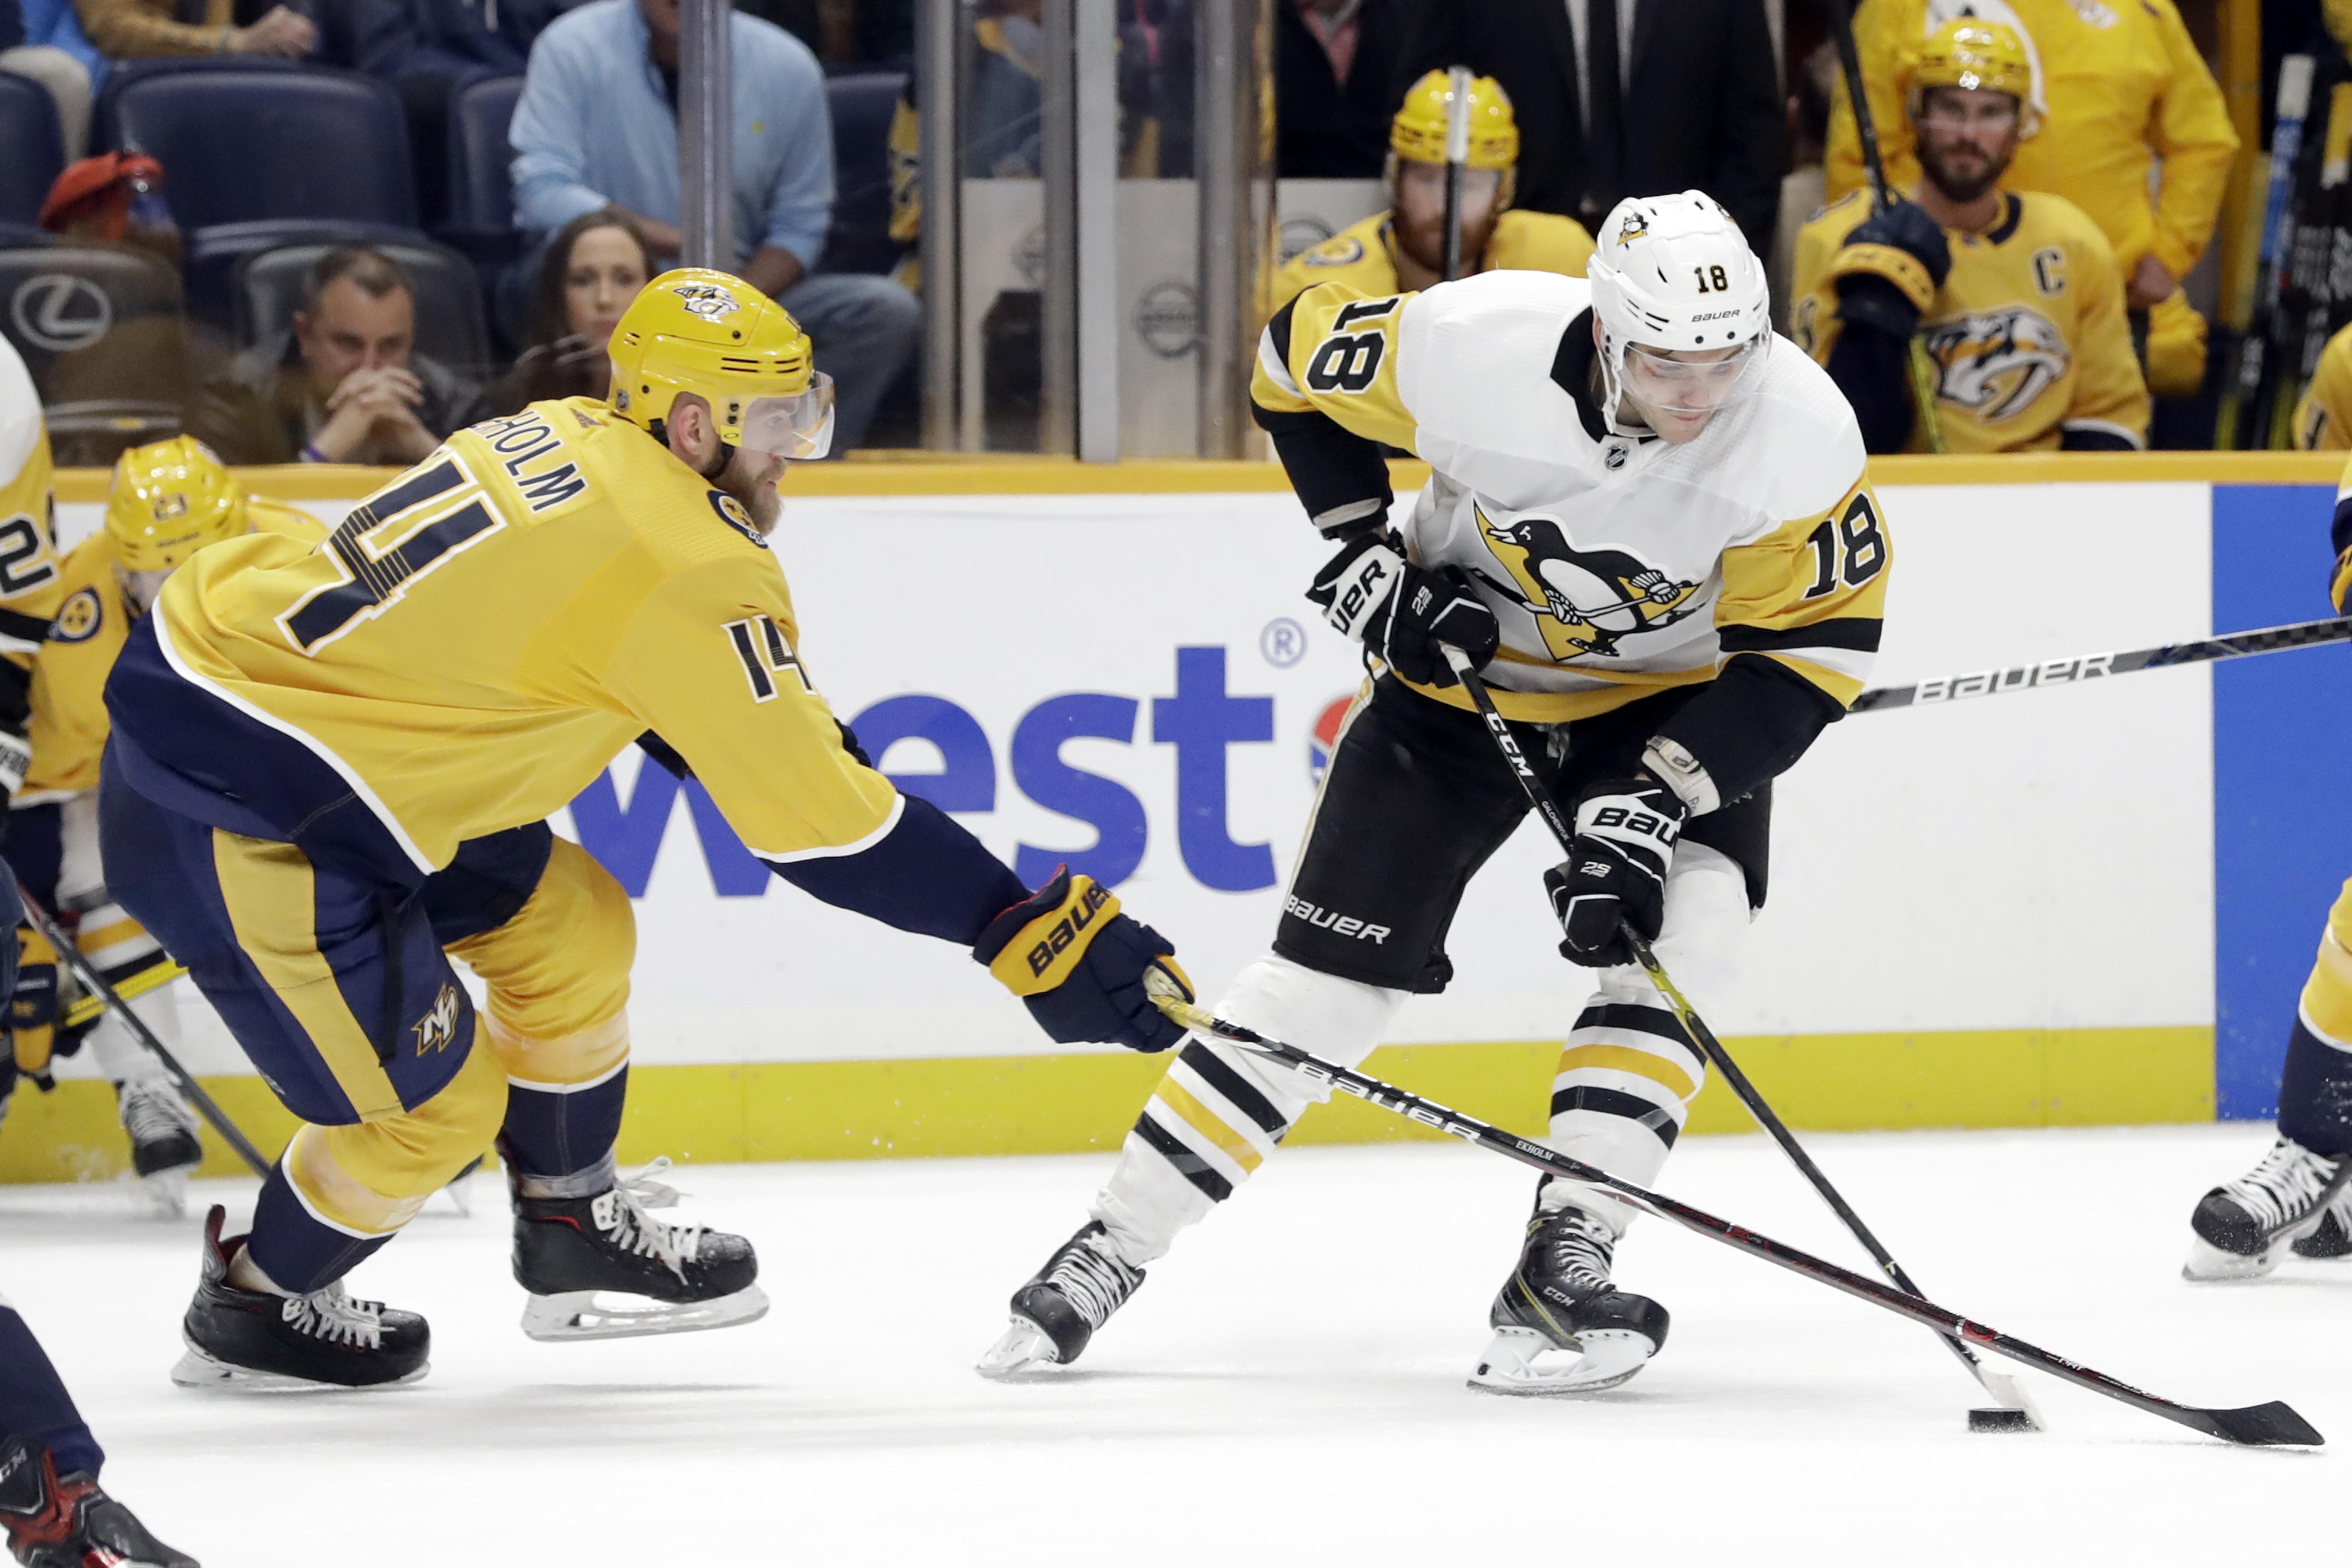 Galchenyuk scores, Penguins thump ailing Predators 5-2